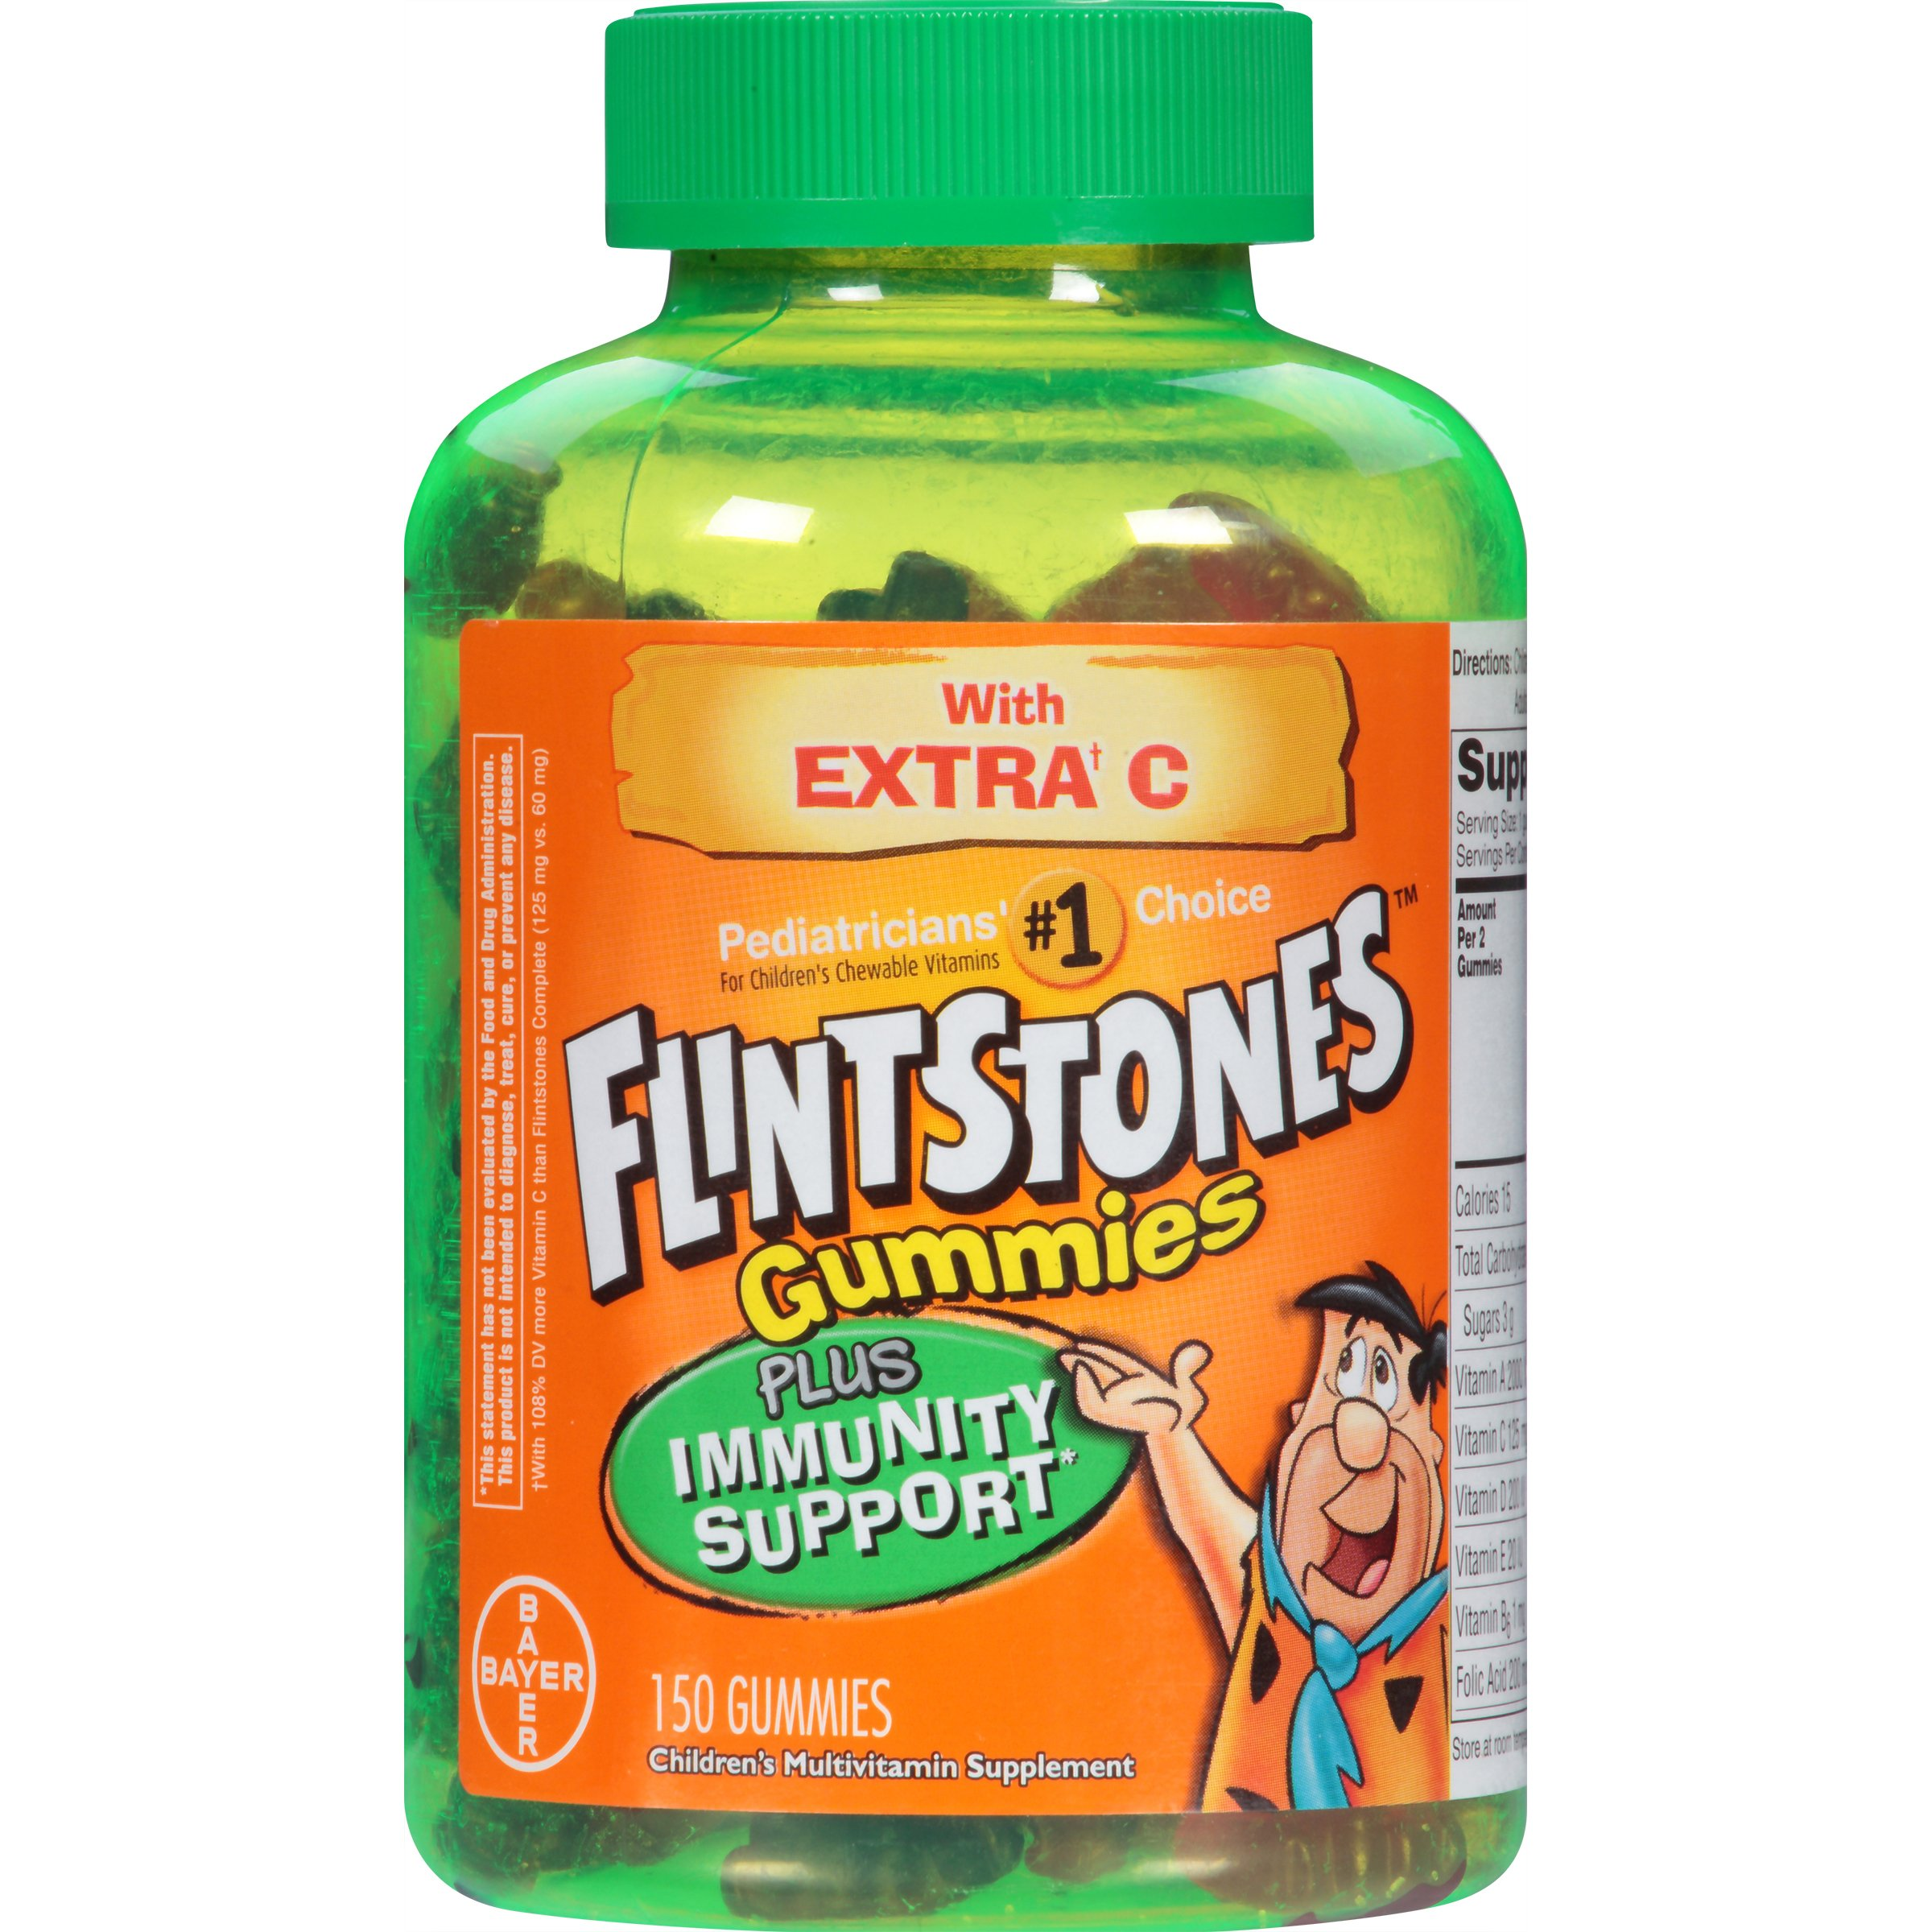 Flintstones Gummies plus Immunity Support, 150 Count